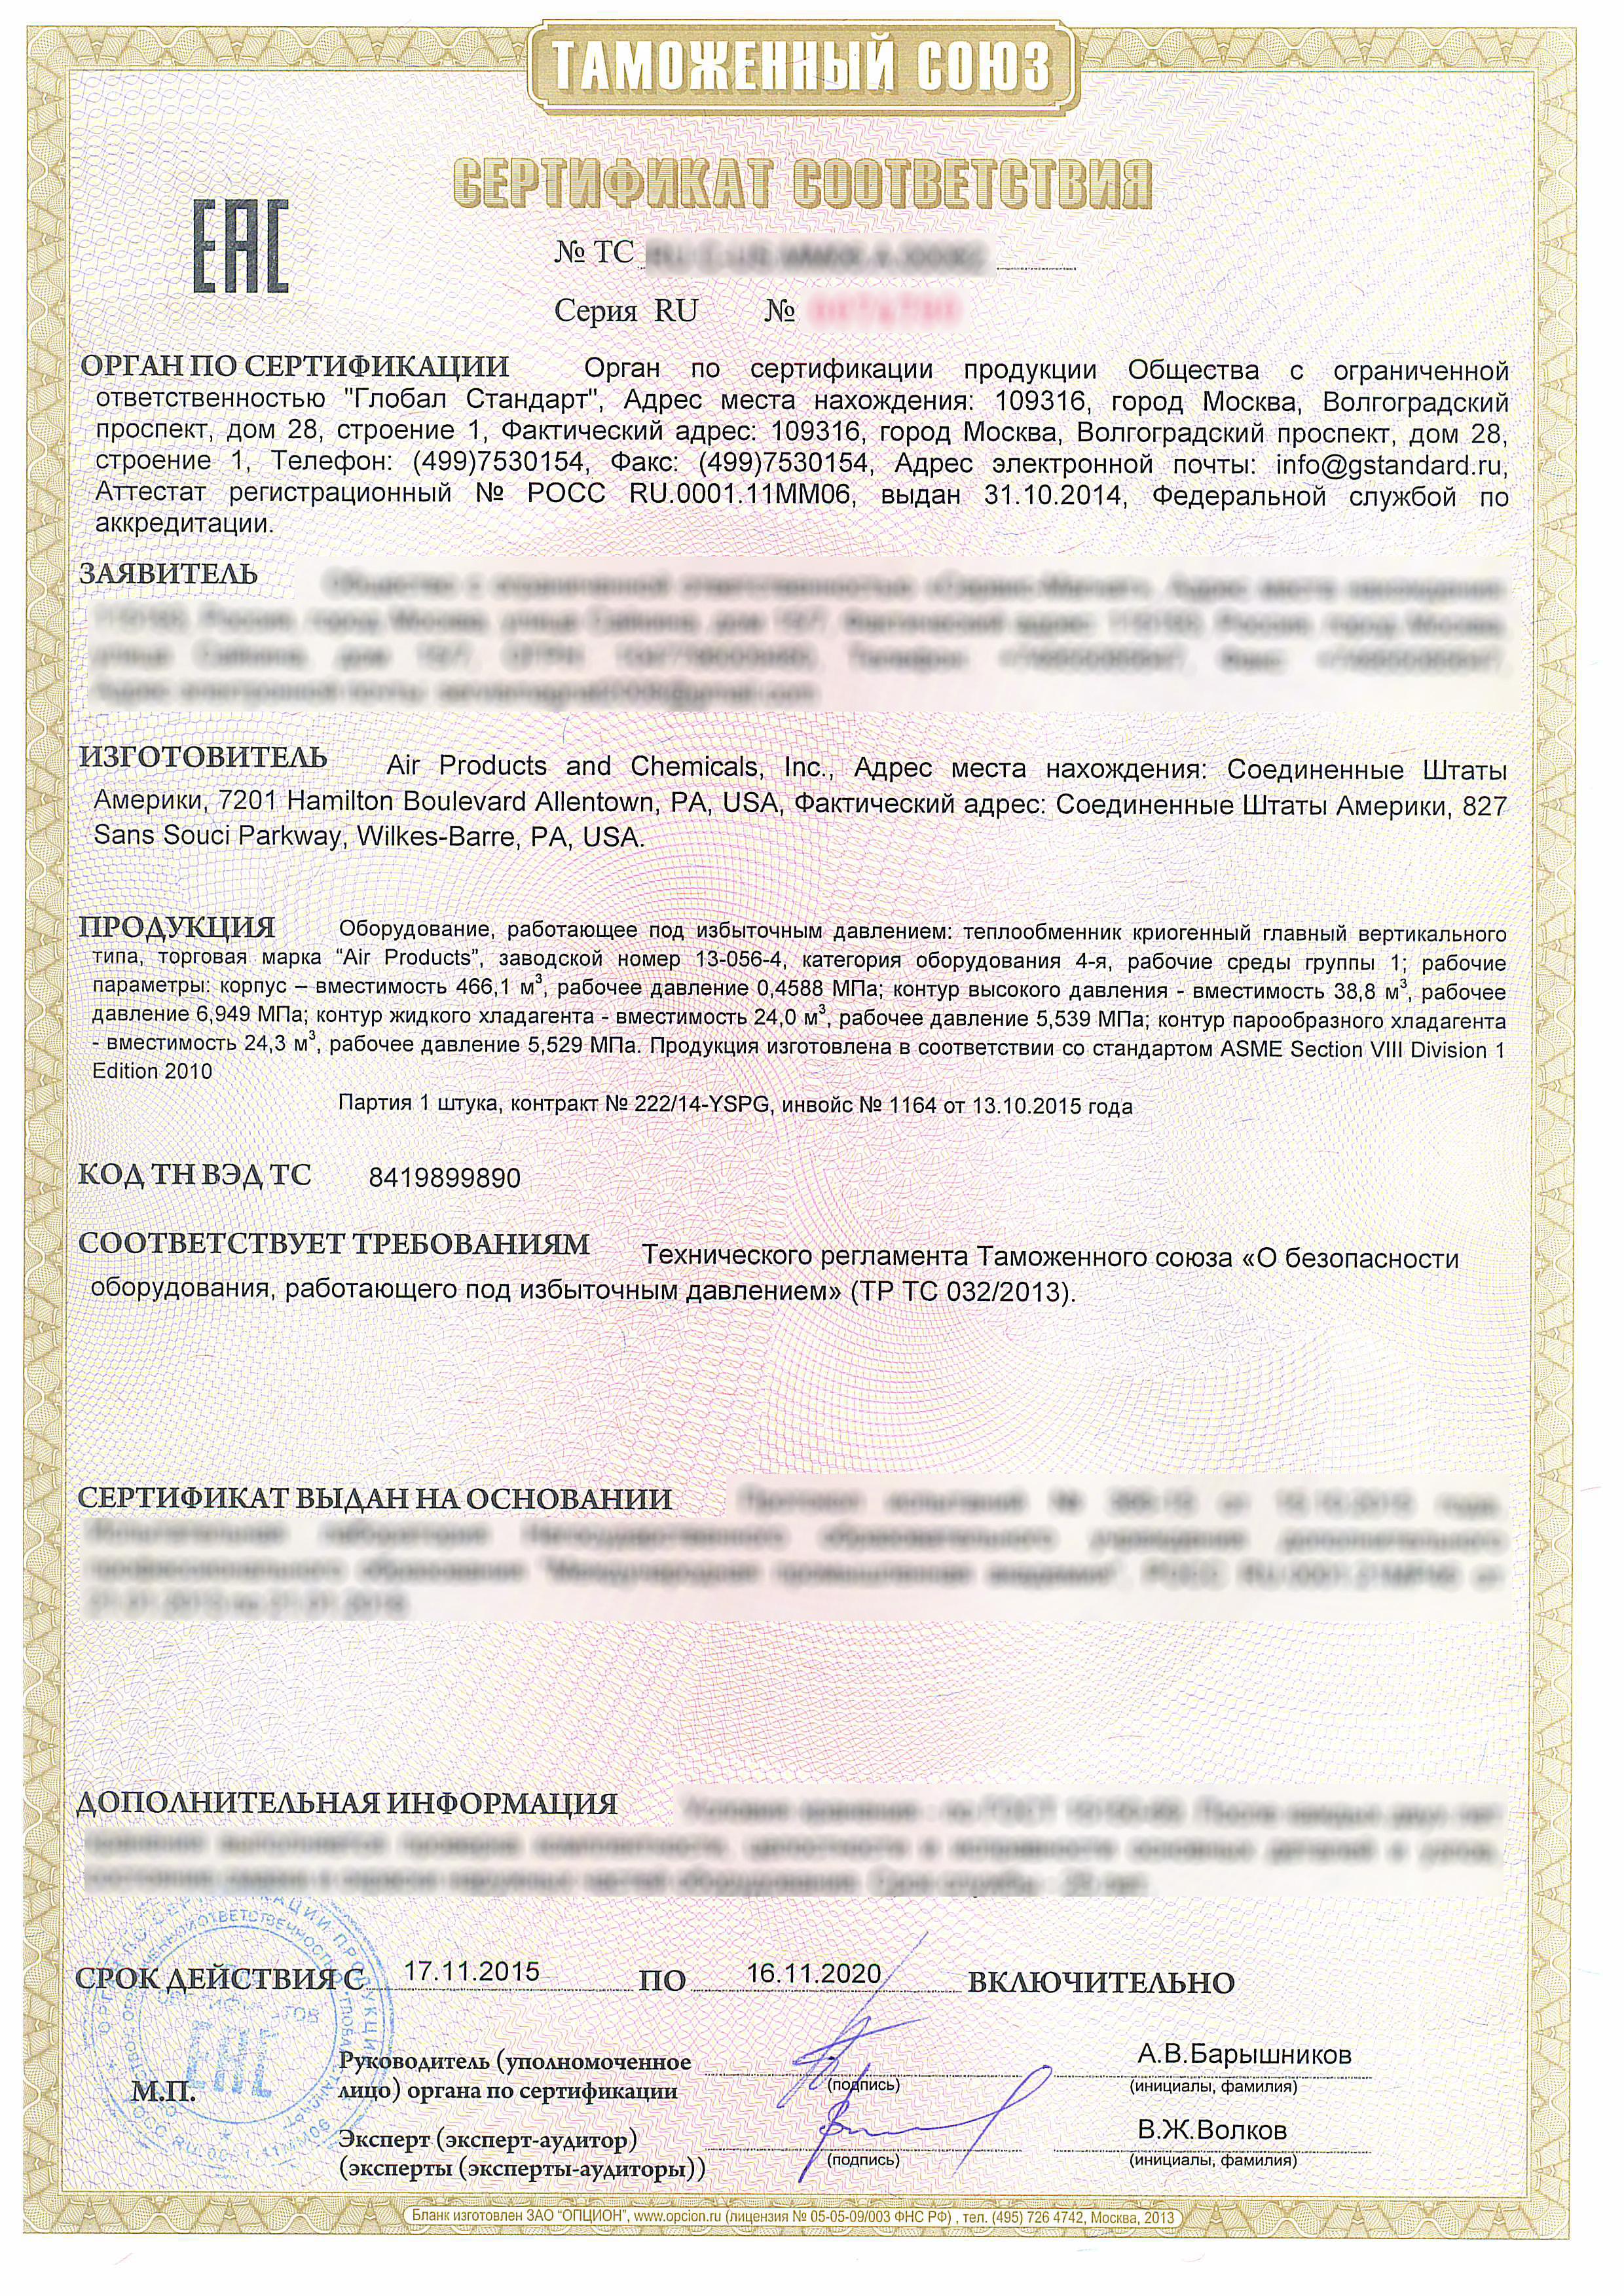 пример-сертификата-тр-тс-032-2013